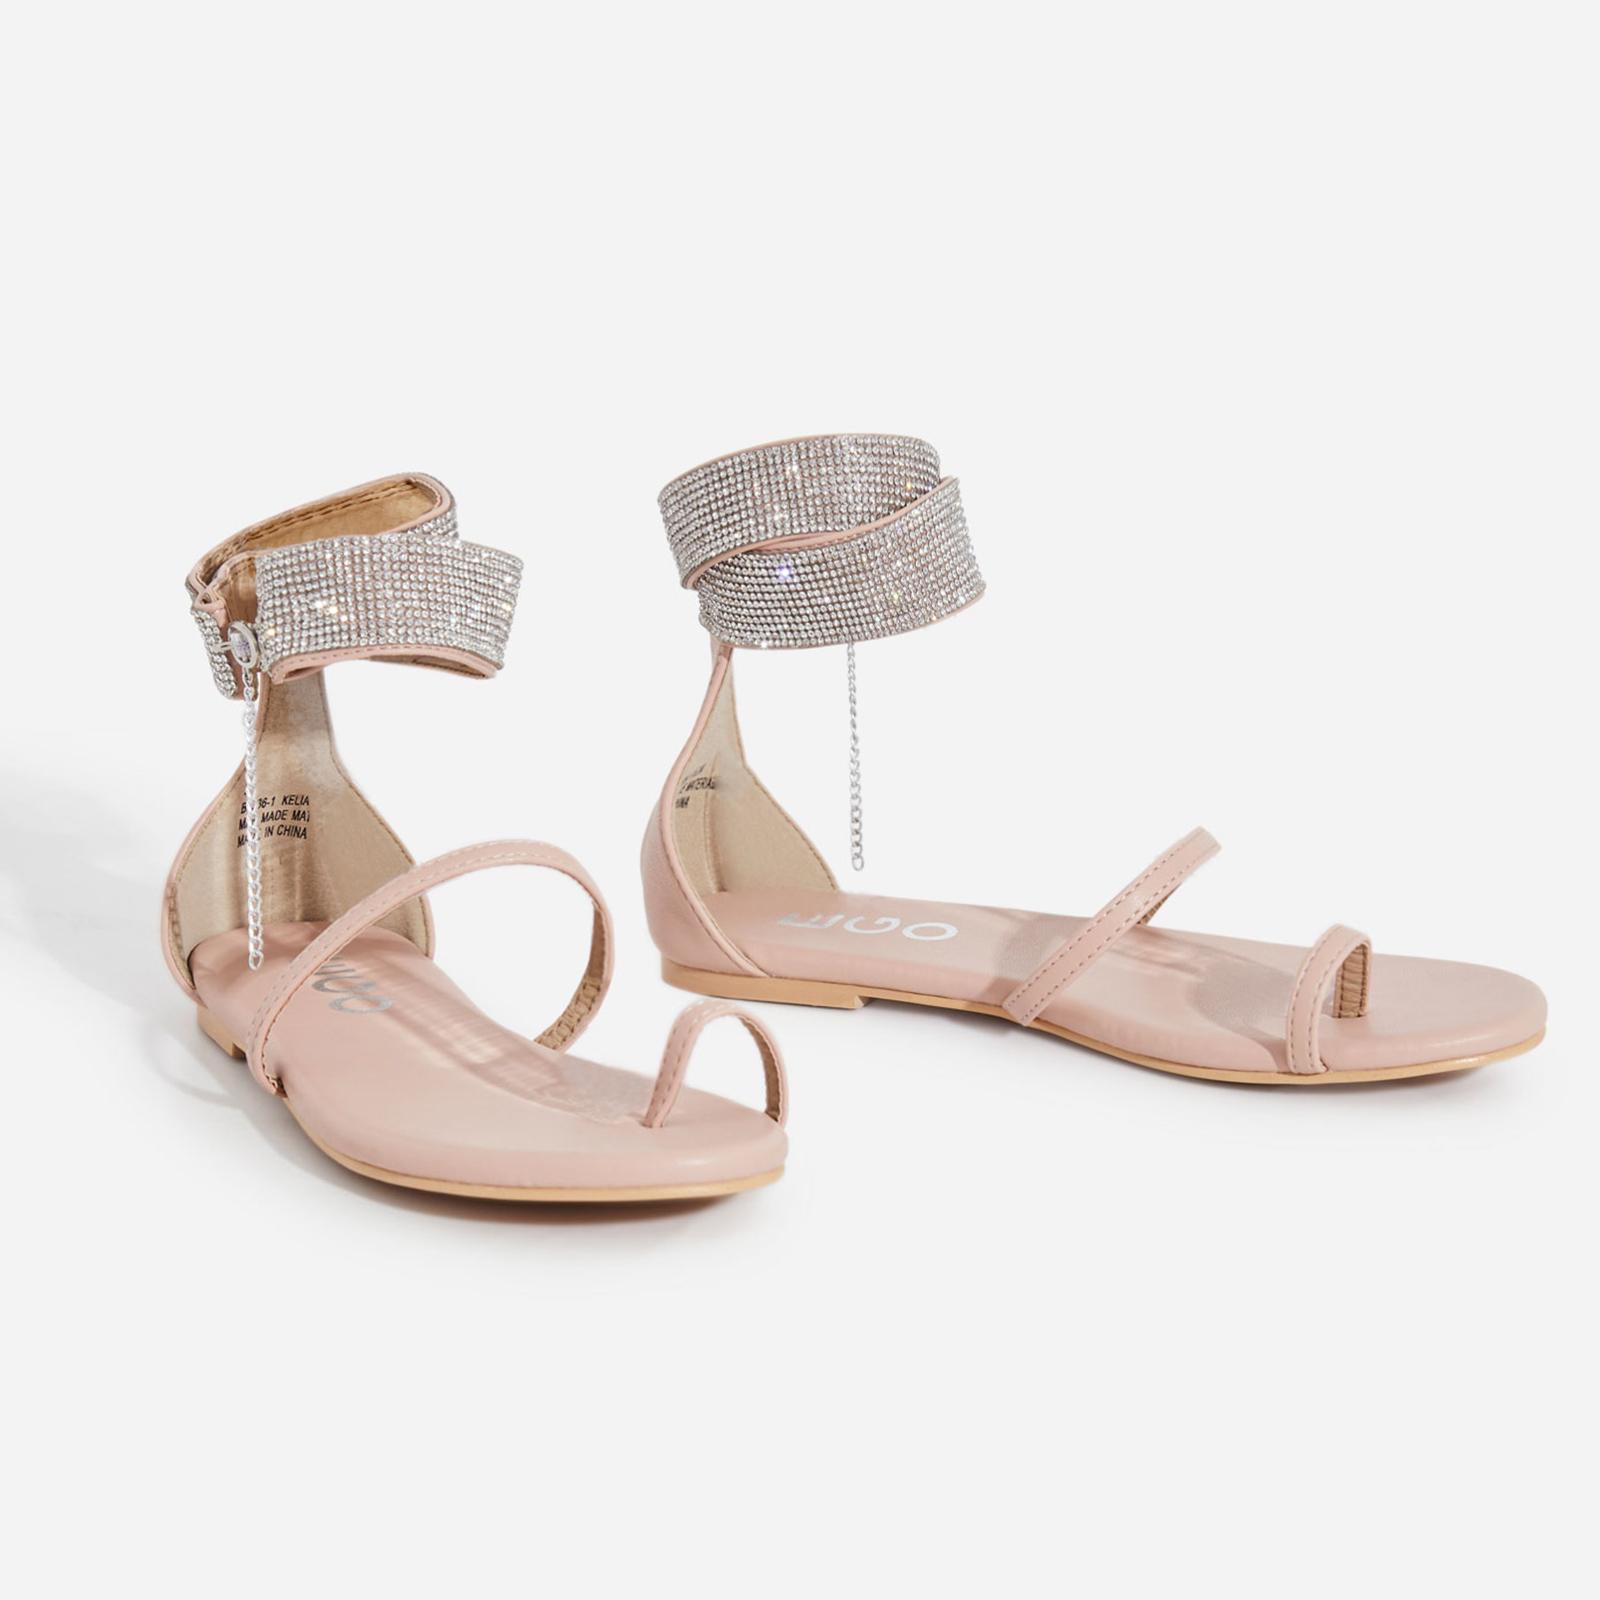 Kelia Diamante Detail Strap Sandal In Nude Faux Leather